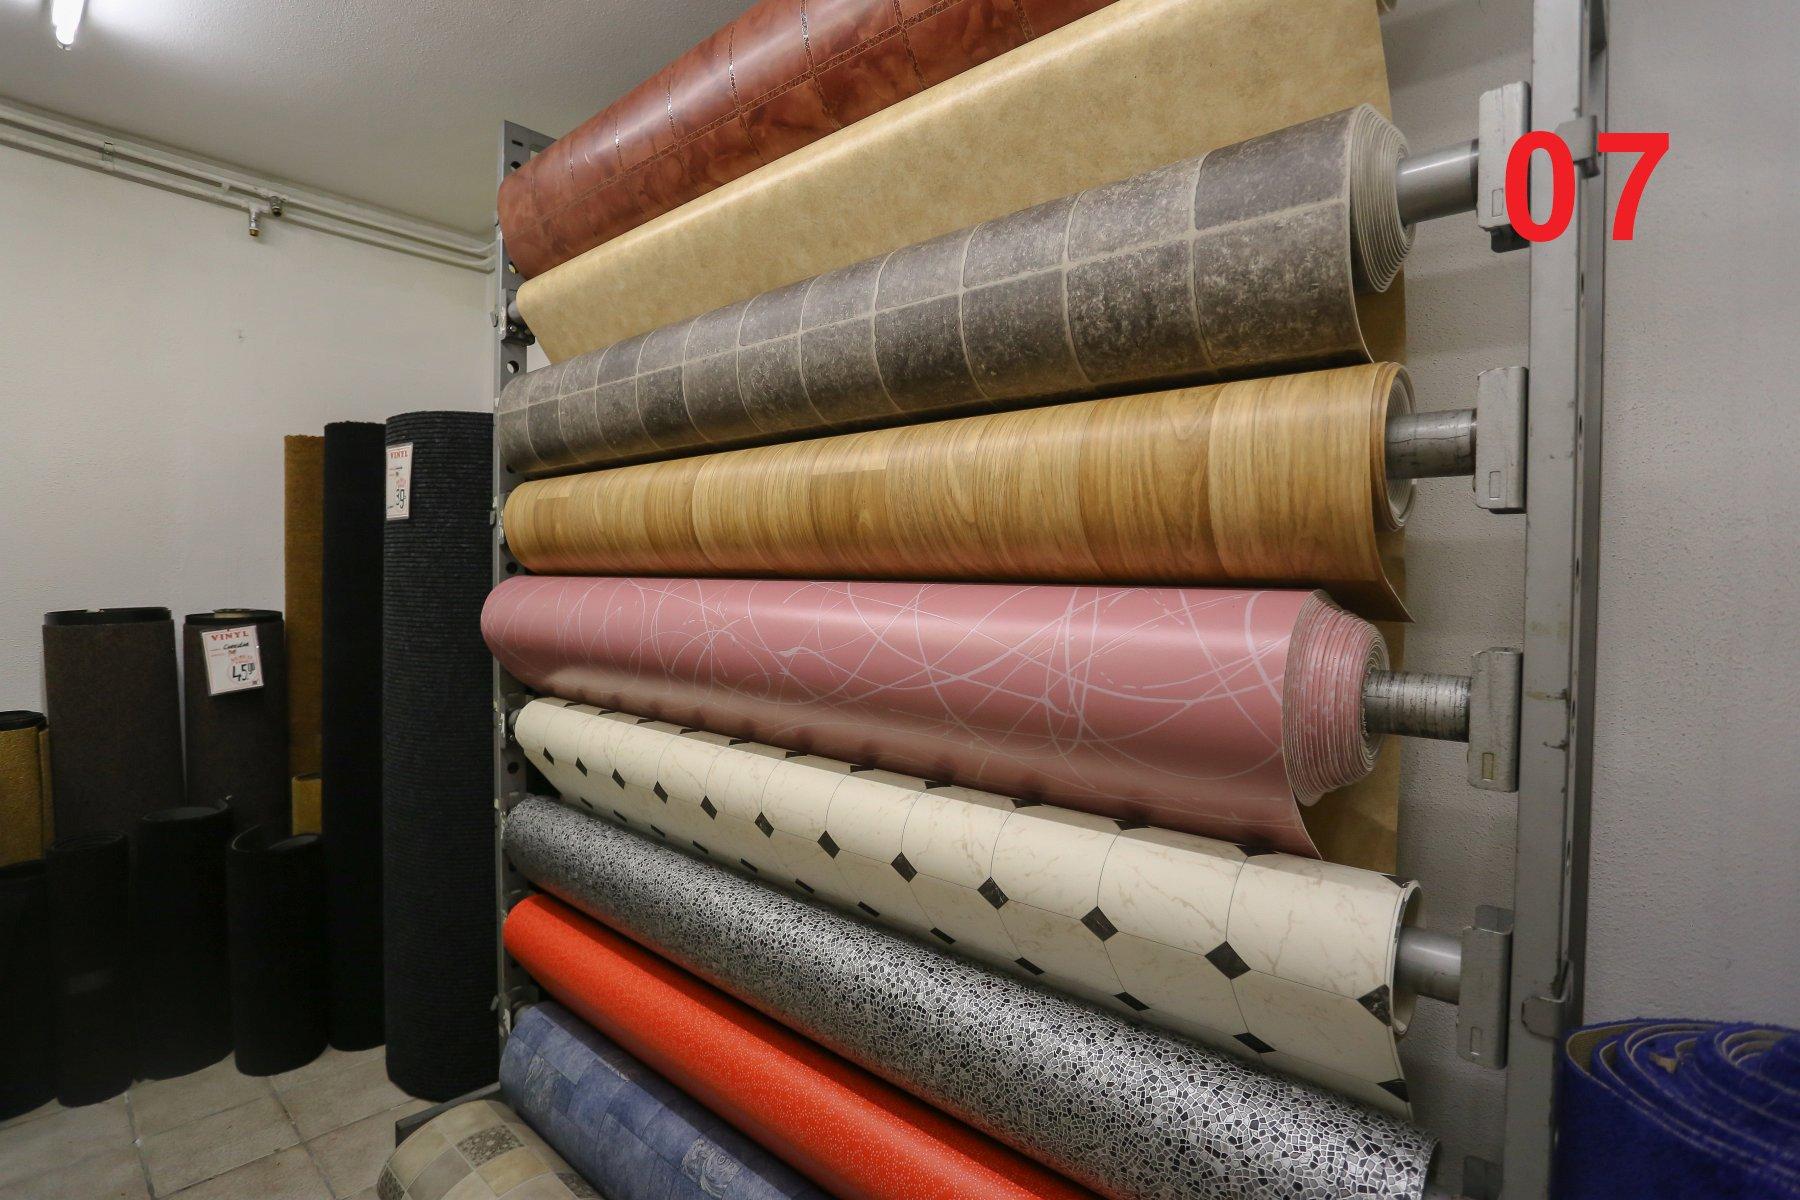 Goedkope Vinyl Restanten : Vinyl aanbieding vanaf u20ac 12 per strekkende meter